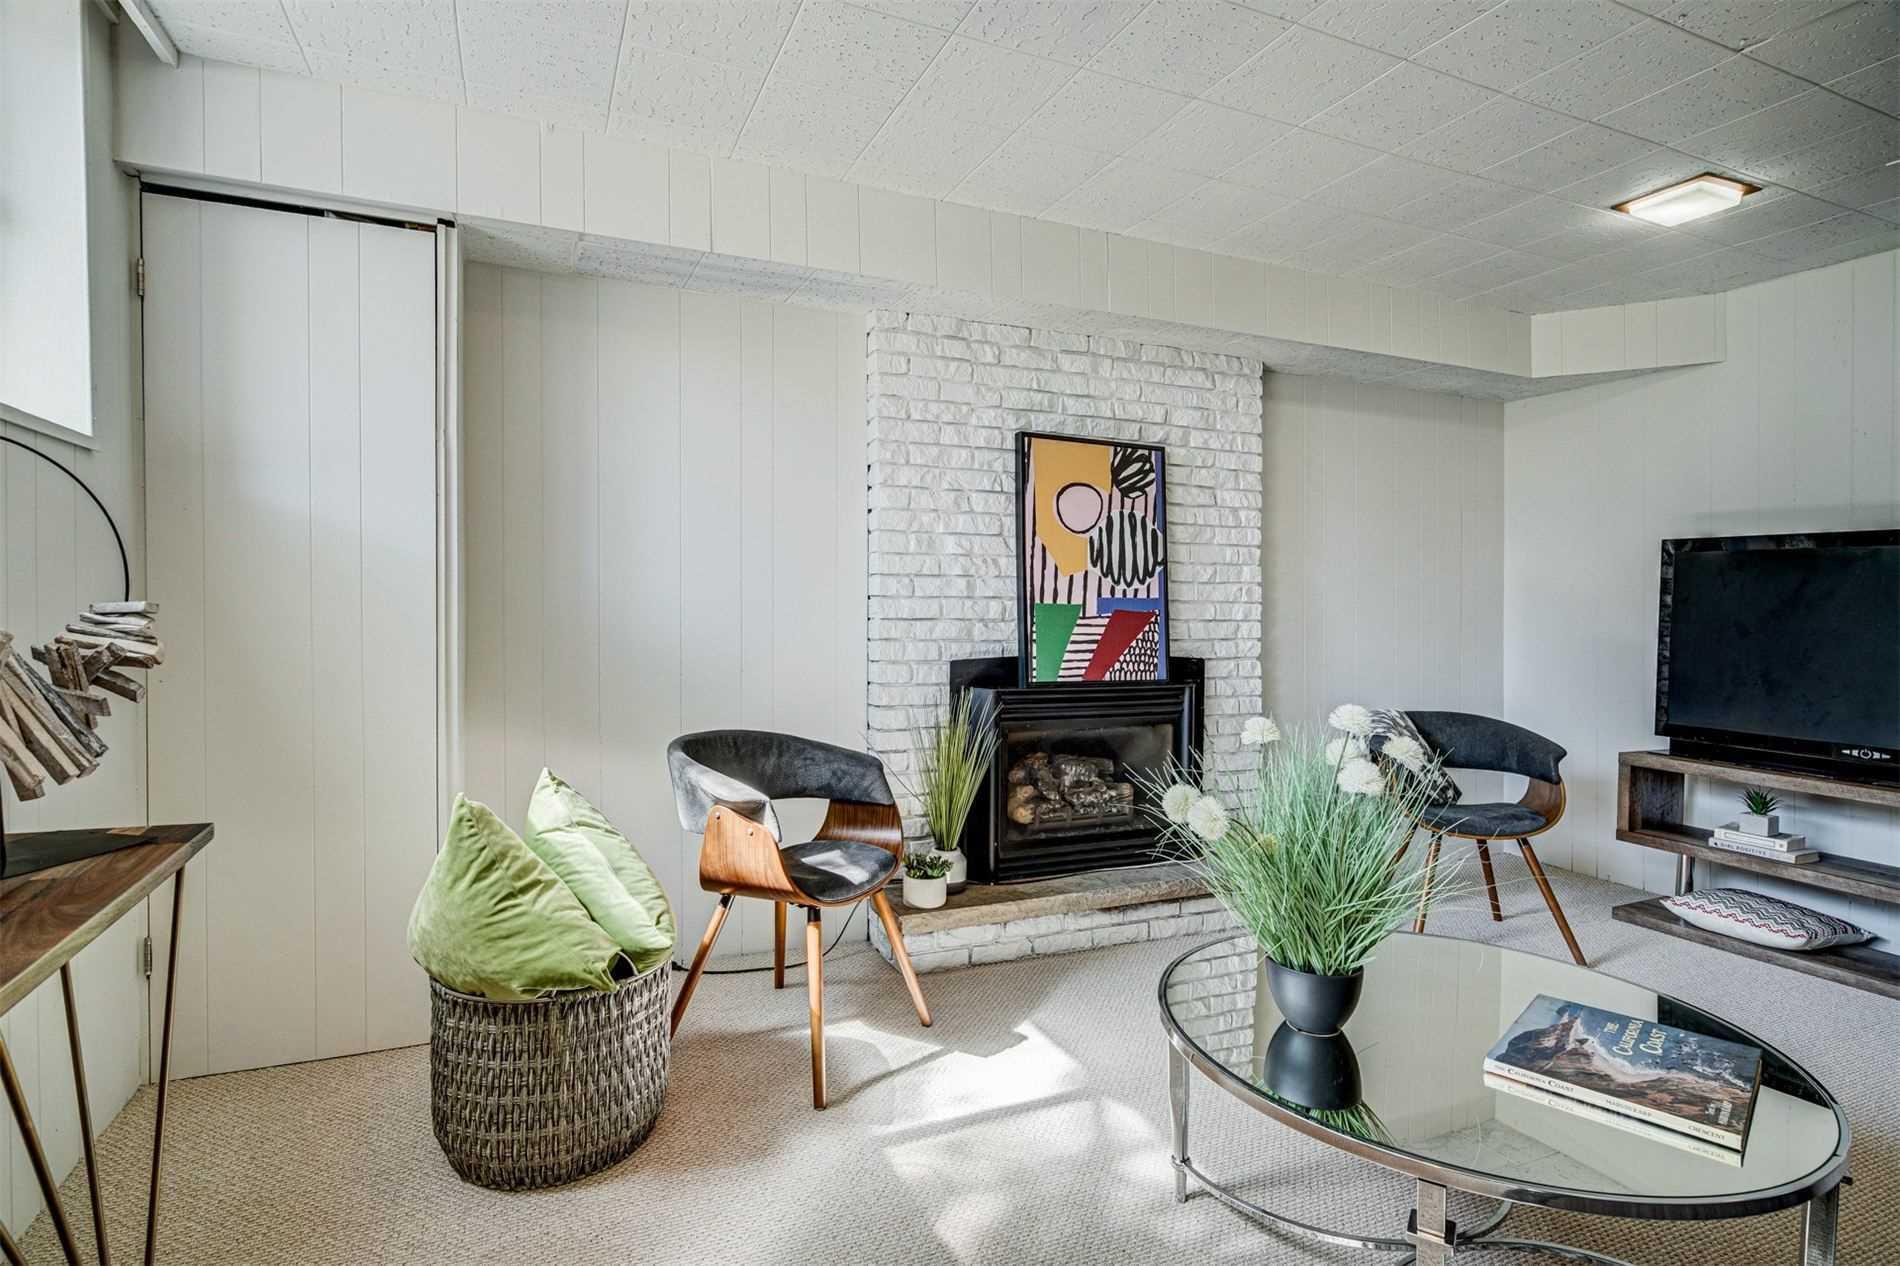 140 Verobeach Blvd - Humbermede Detached for sale, 3 Bedrooms (W5385046) - #25